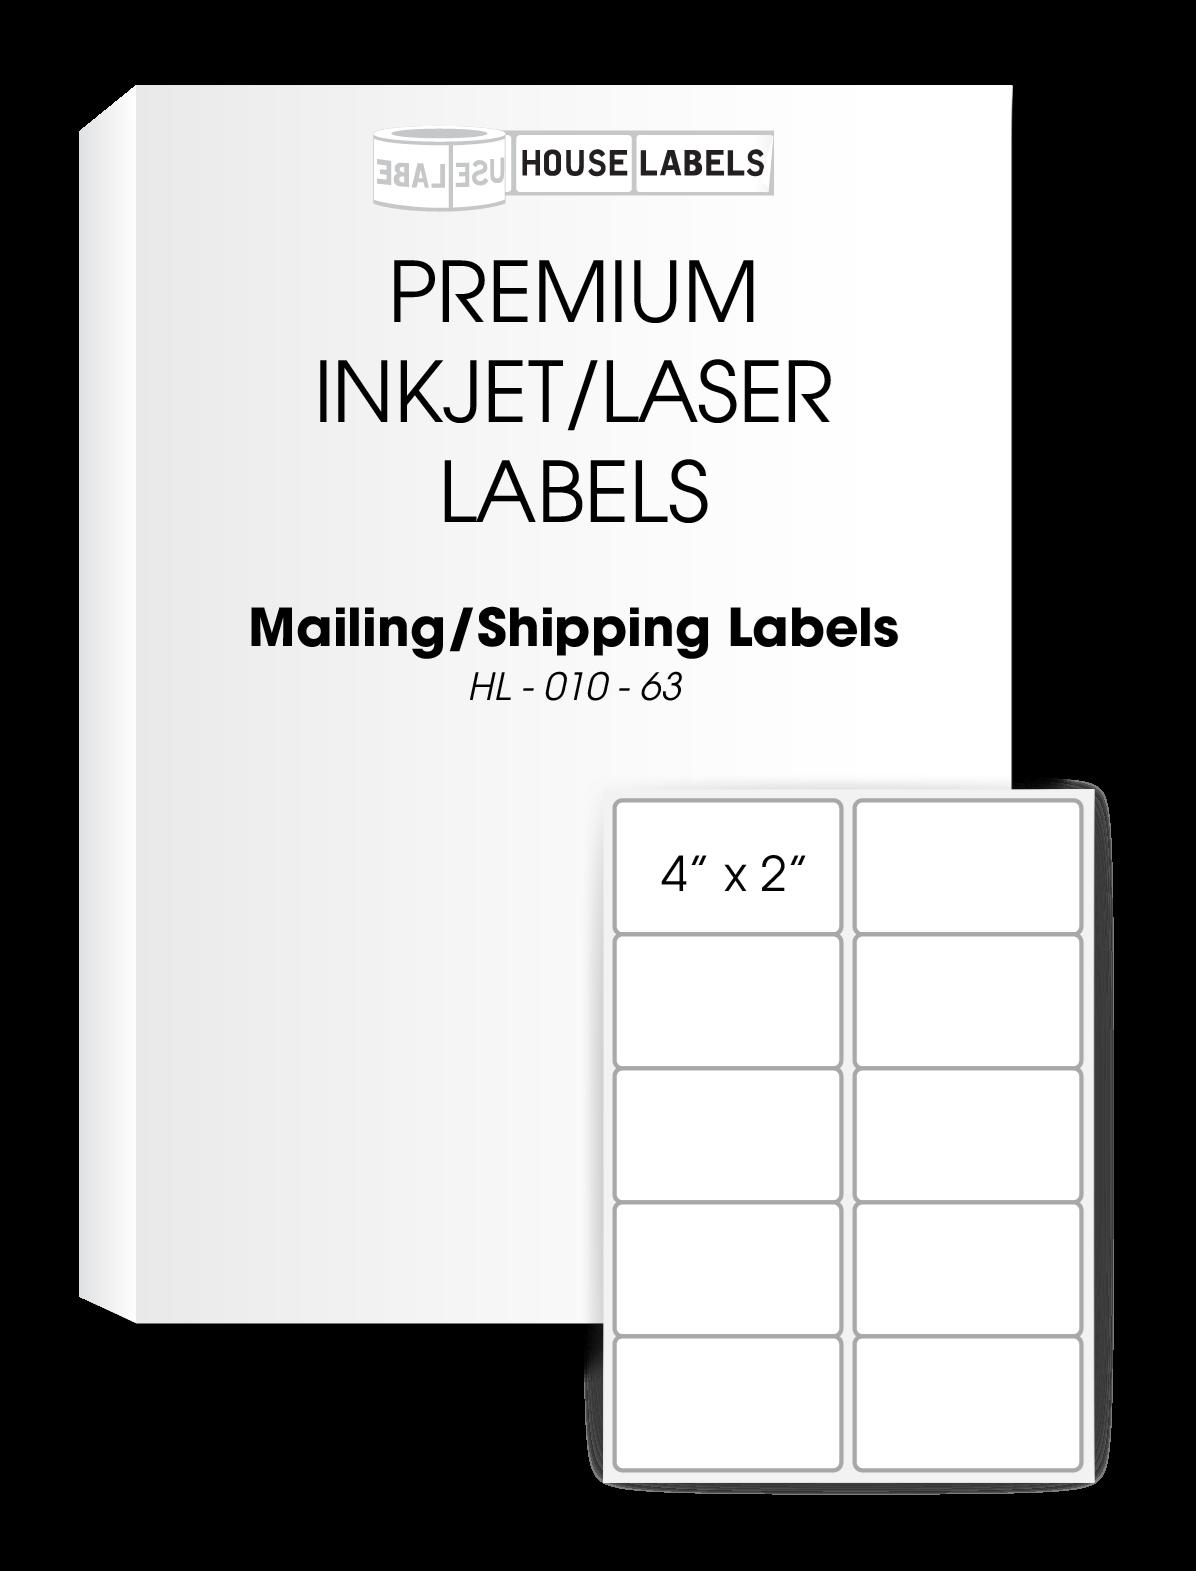 self adhesive labels for all printers houselabels com print